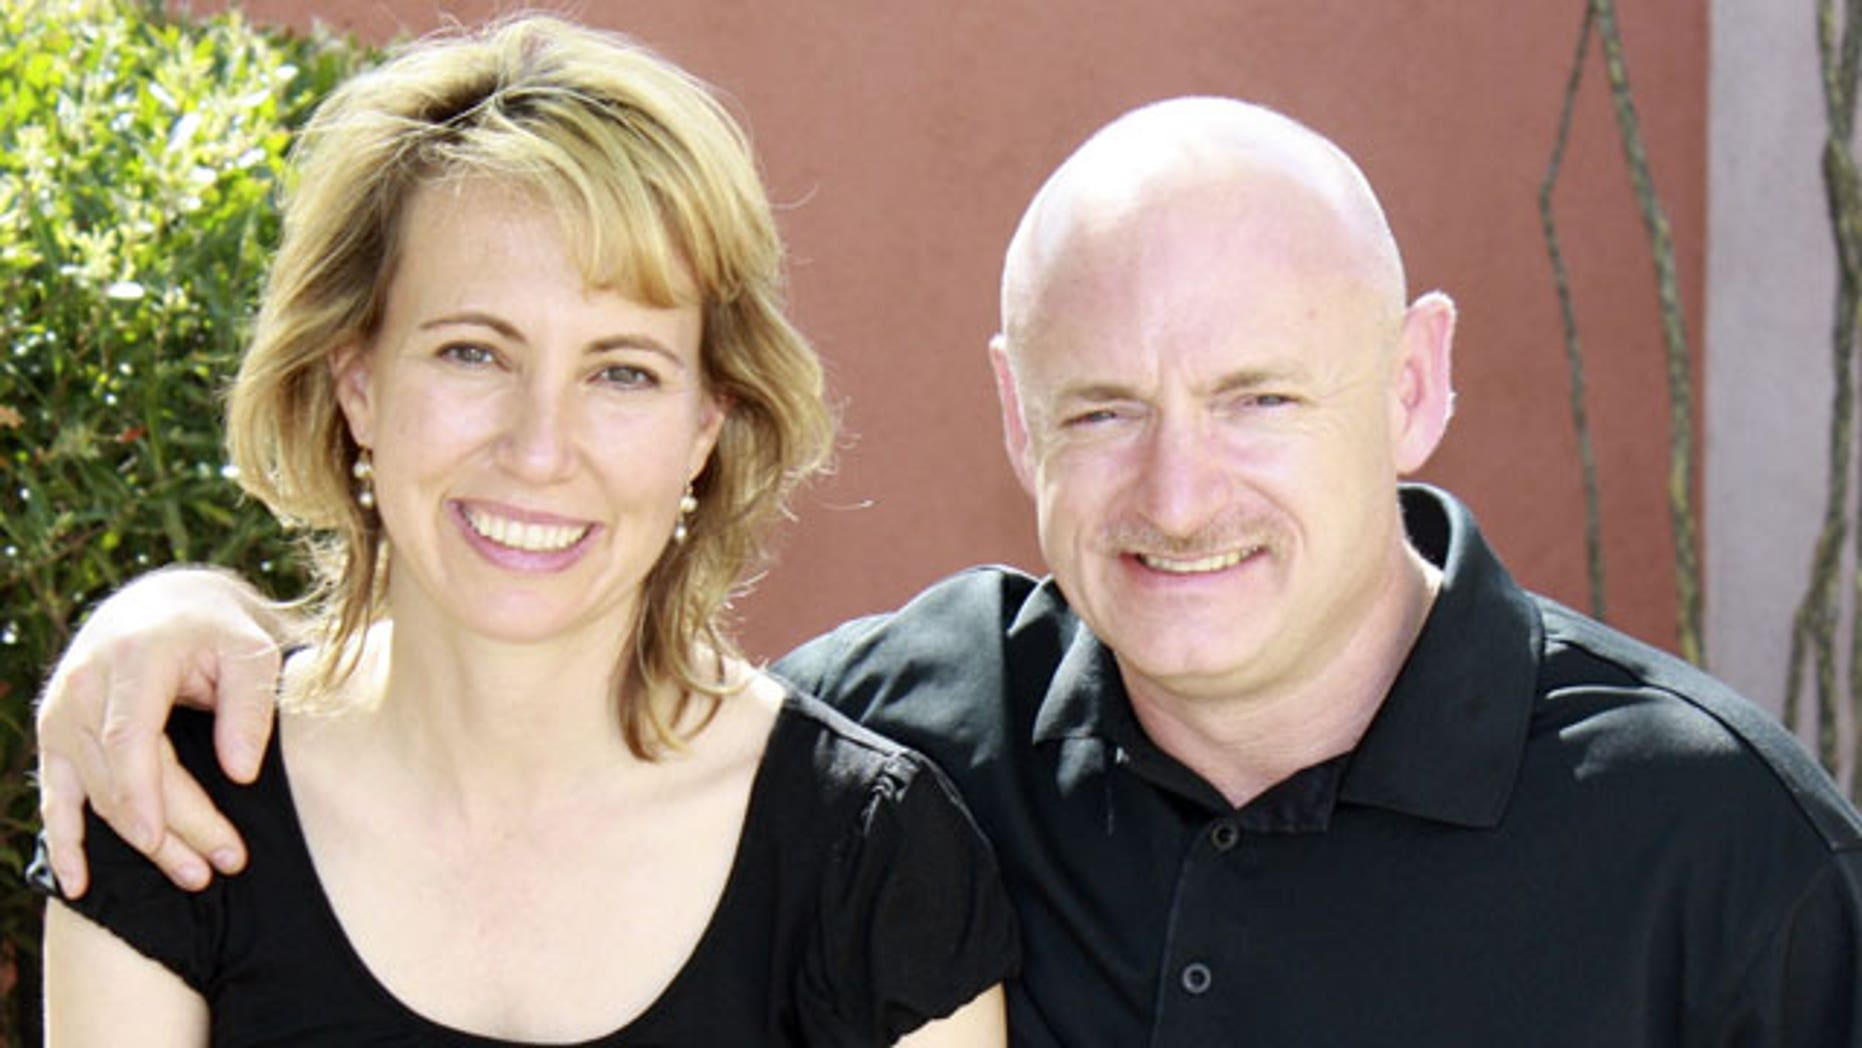 U.S. Rep. Gabrielle Giffords and husband Mark Kelly